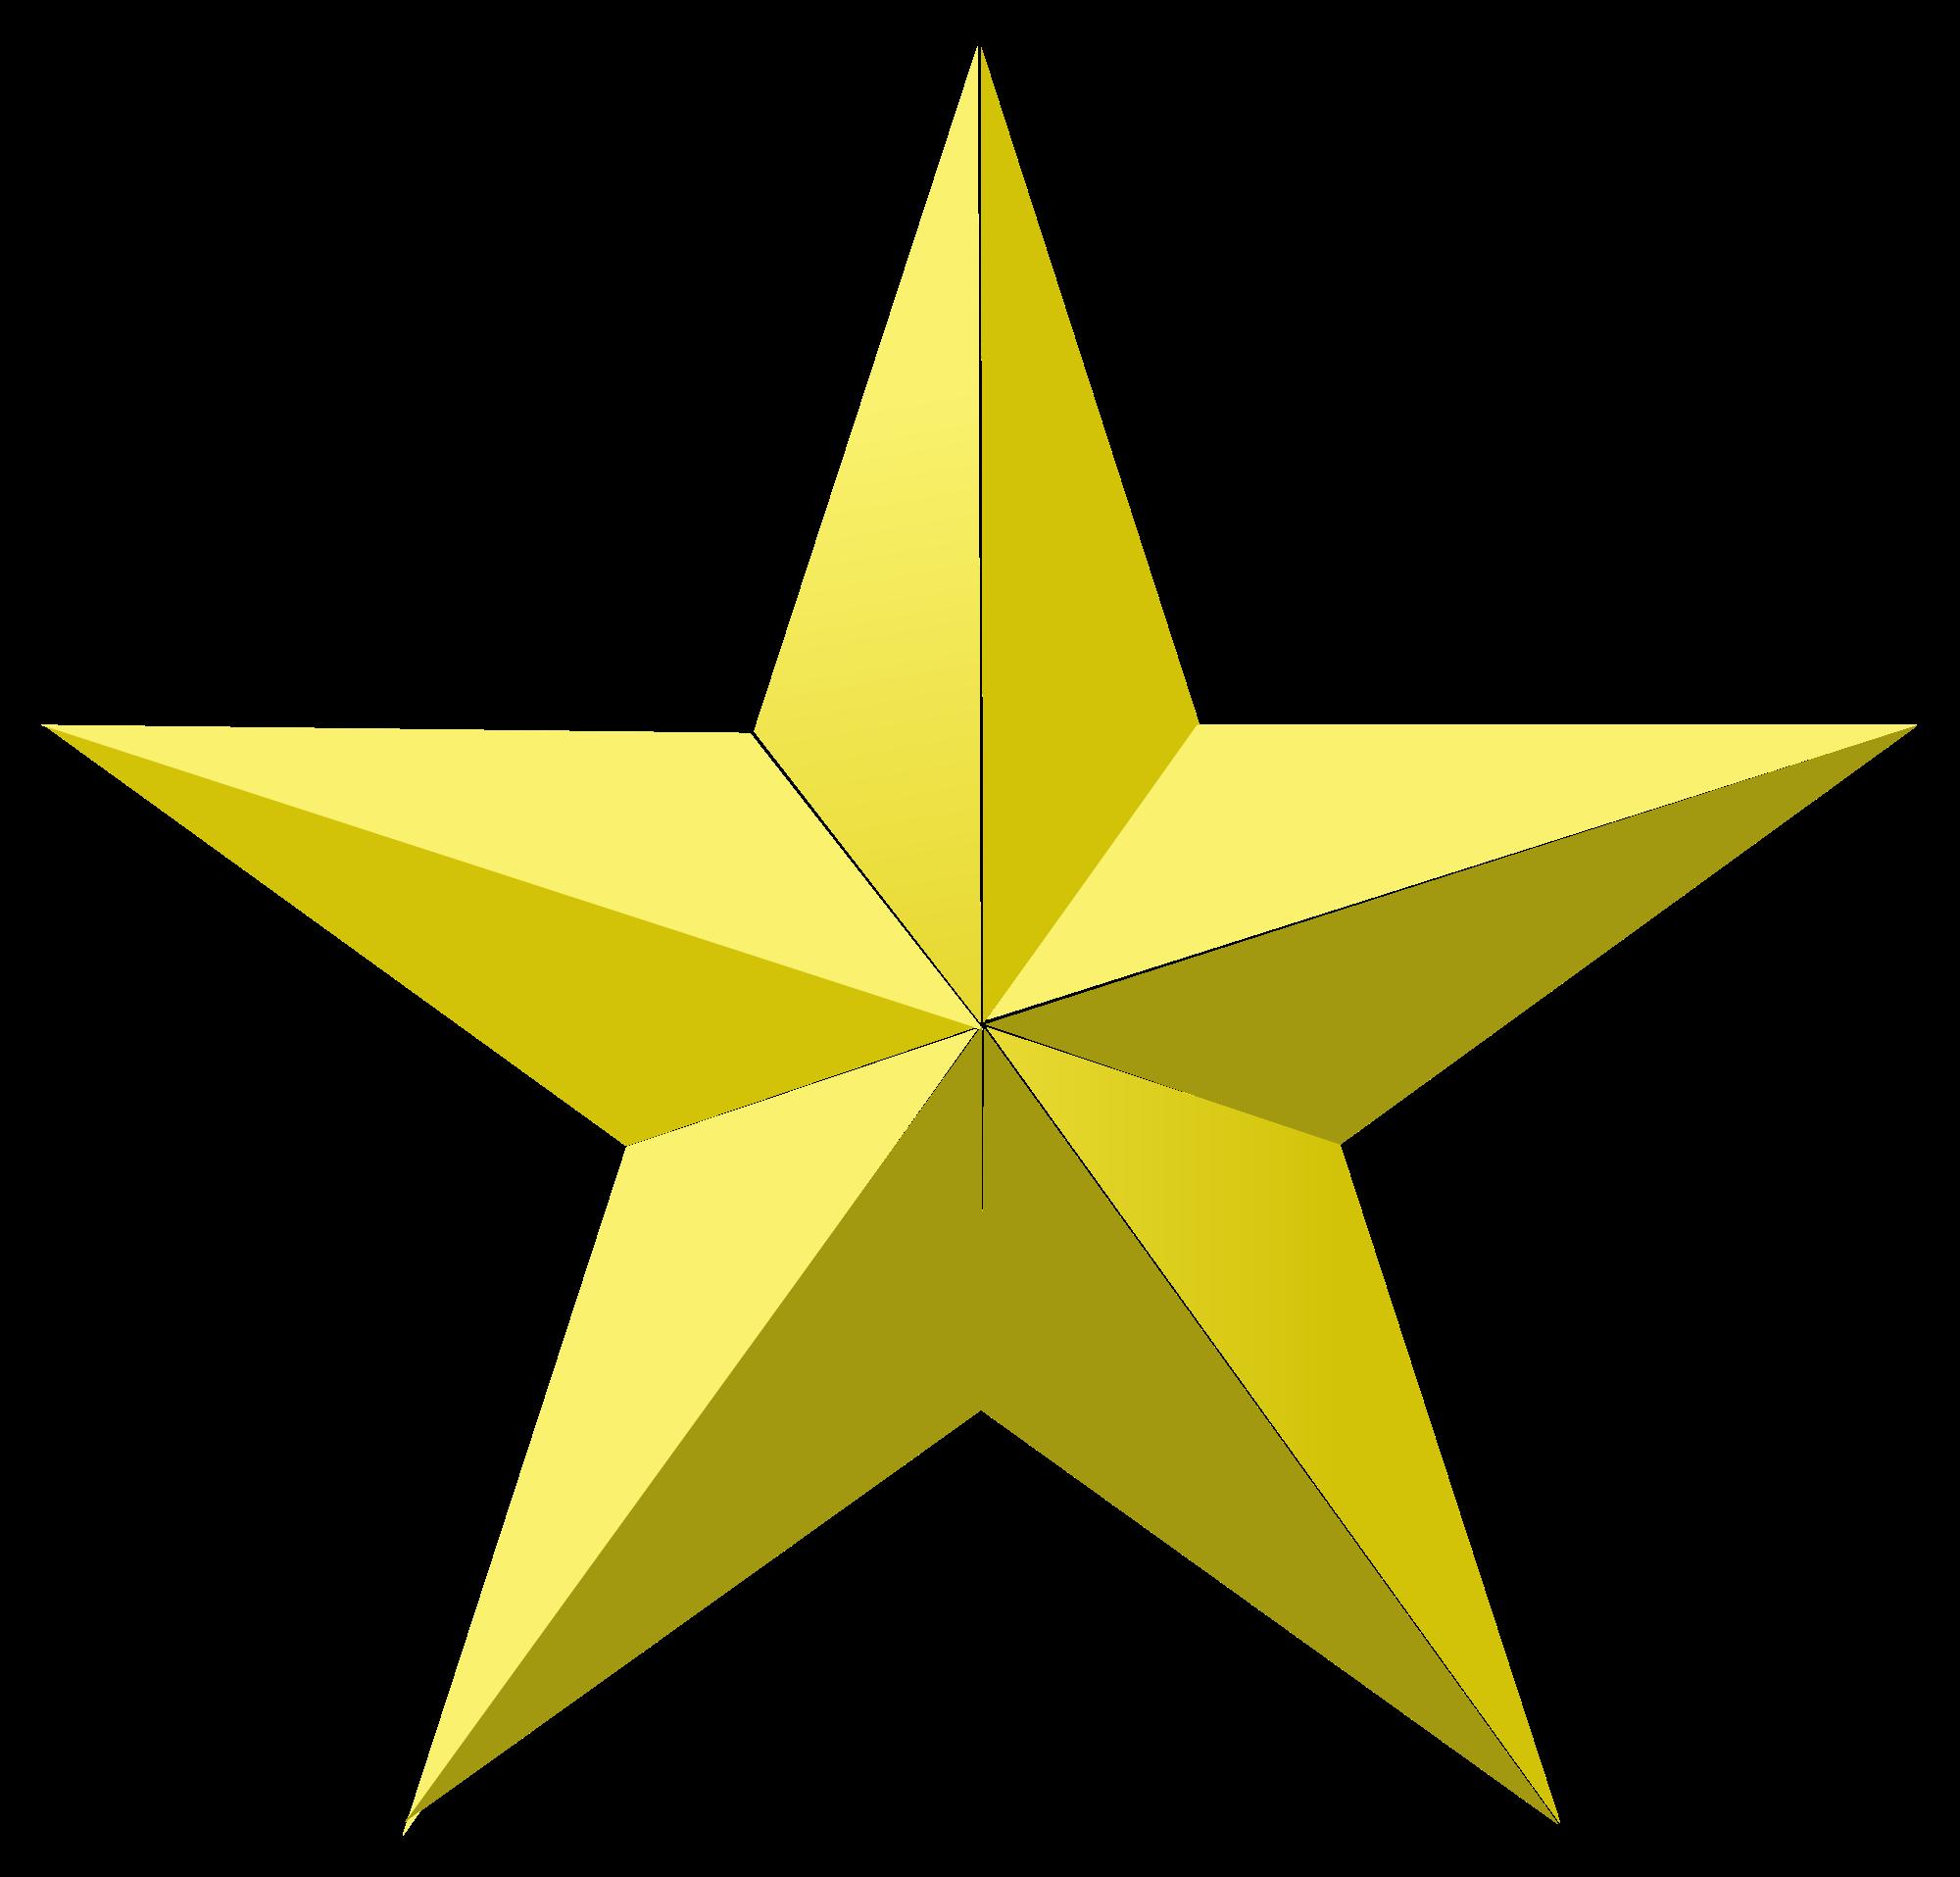 Gold Star PNG Image - PurePNG   Free transparent CC0 PNG ...